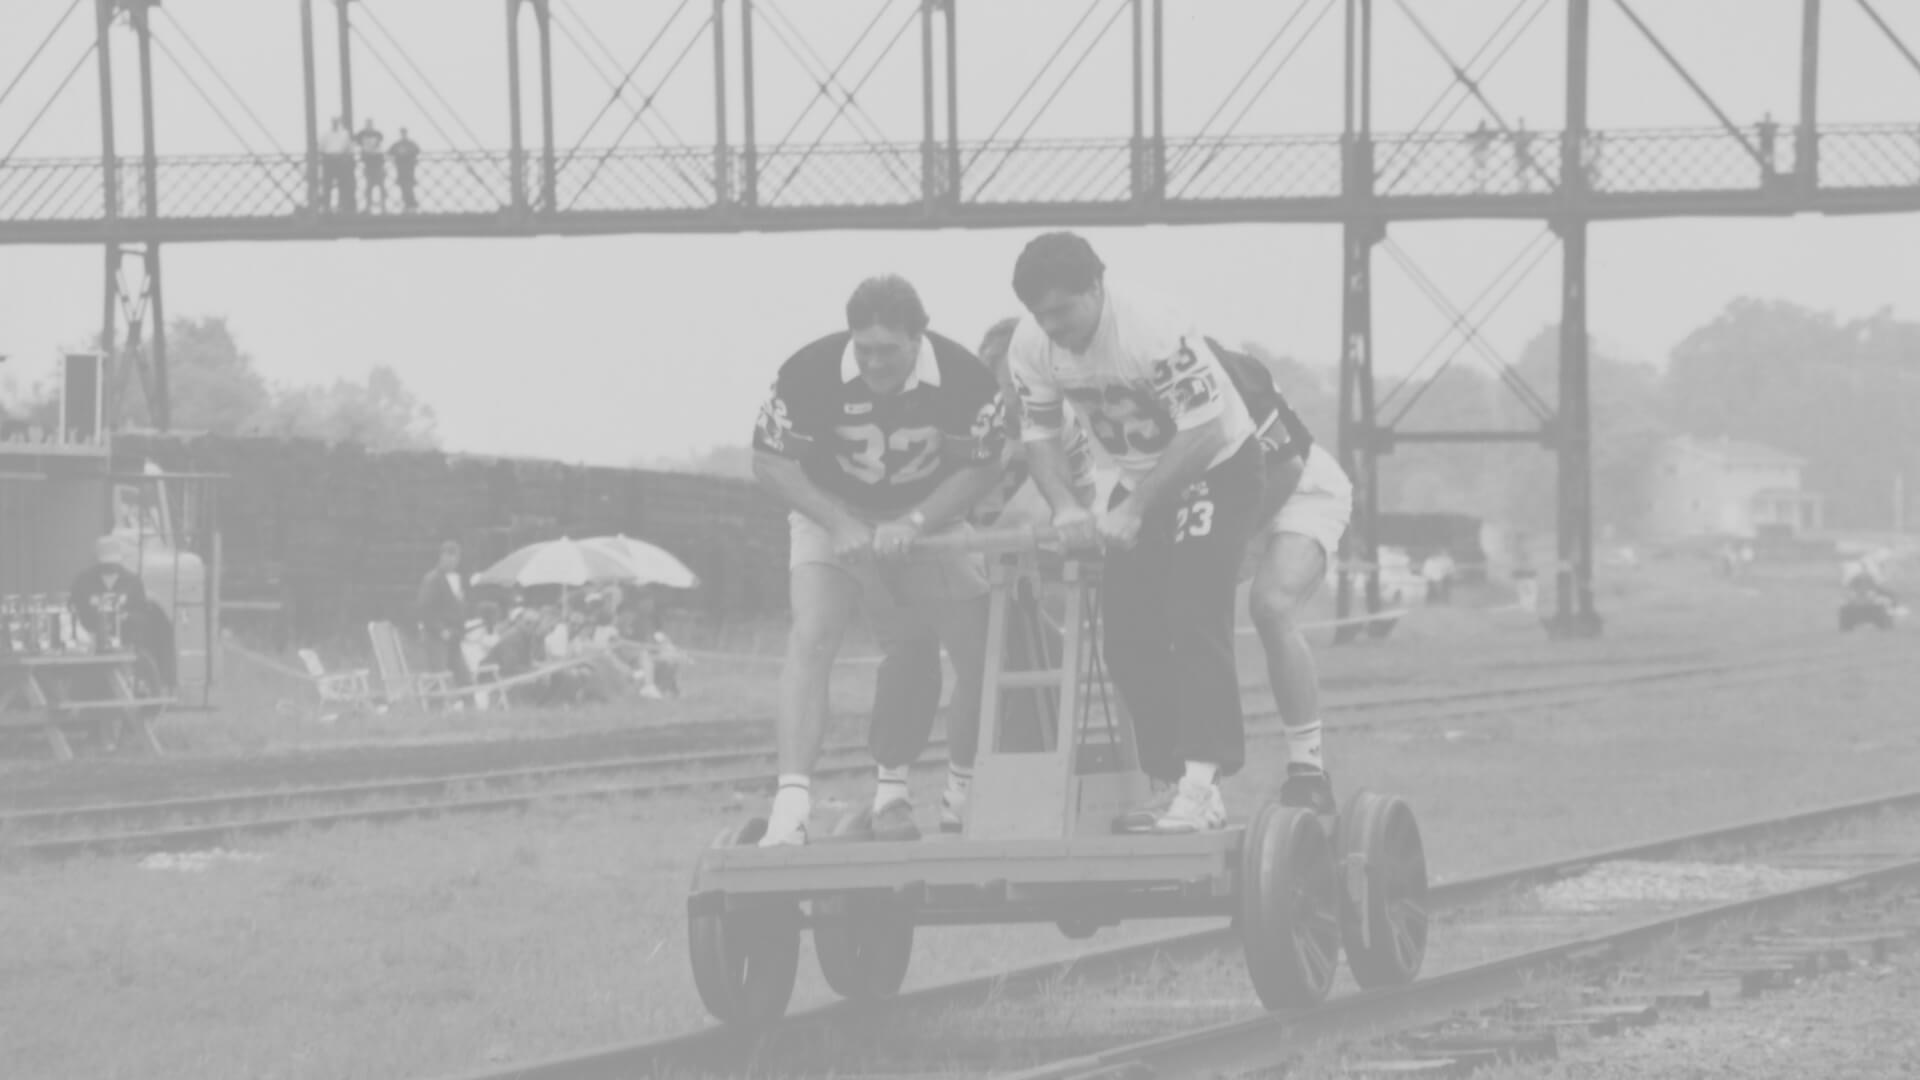 palmerston handcar races 1992